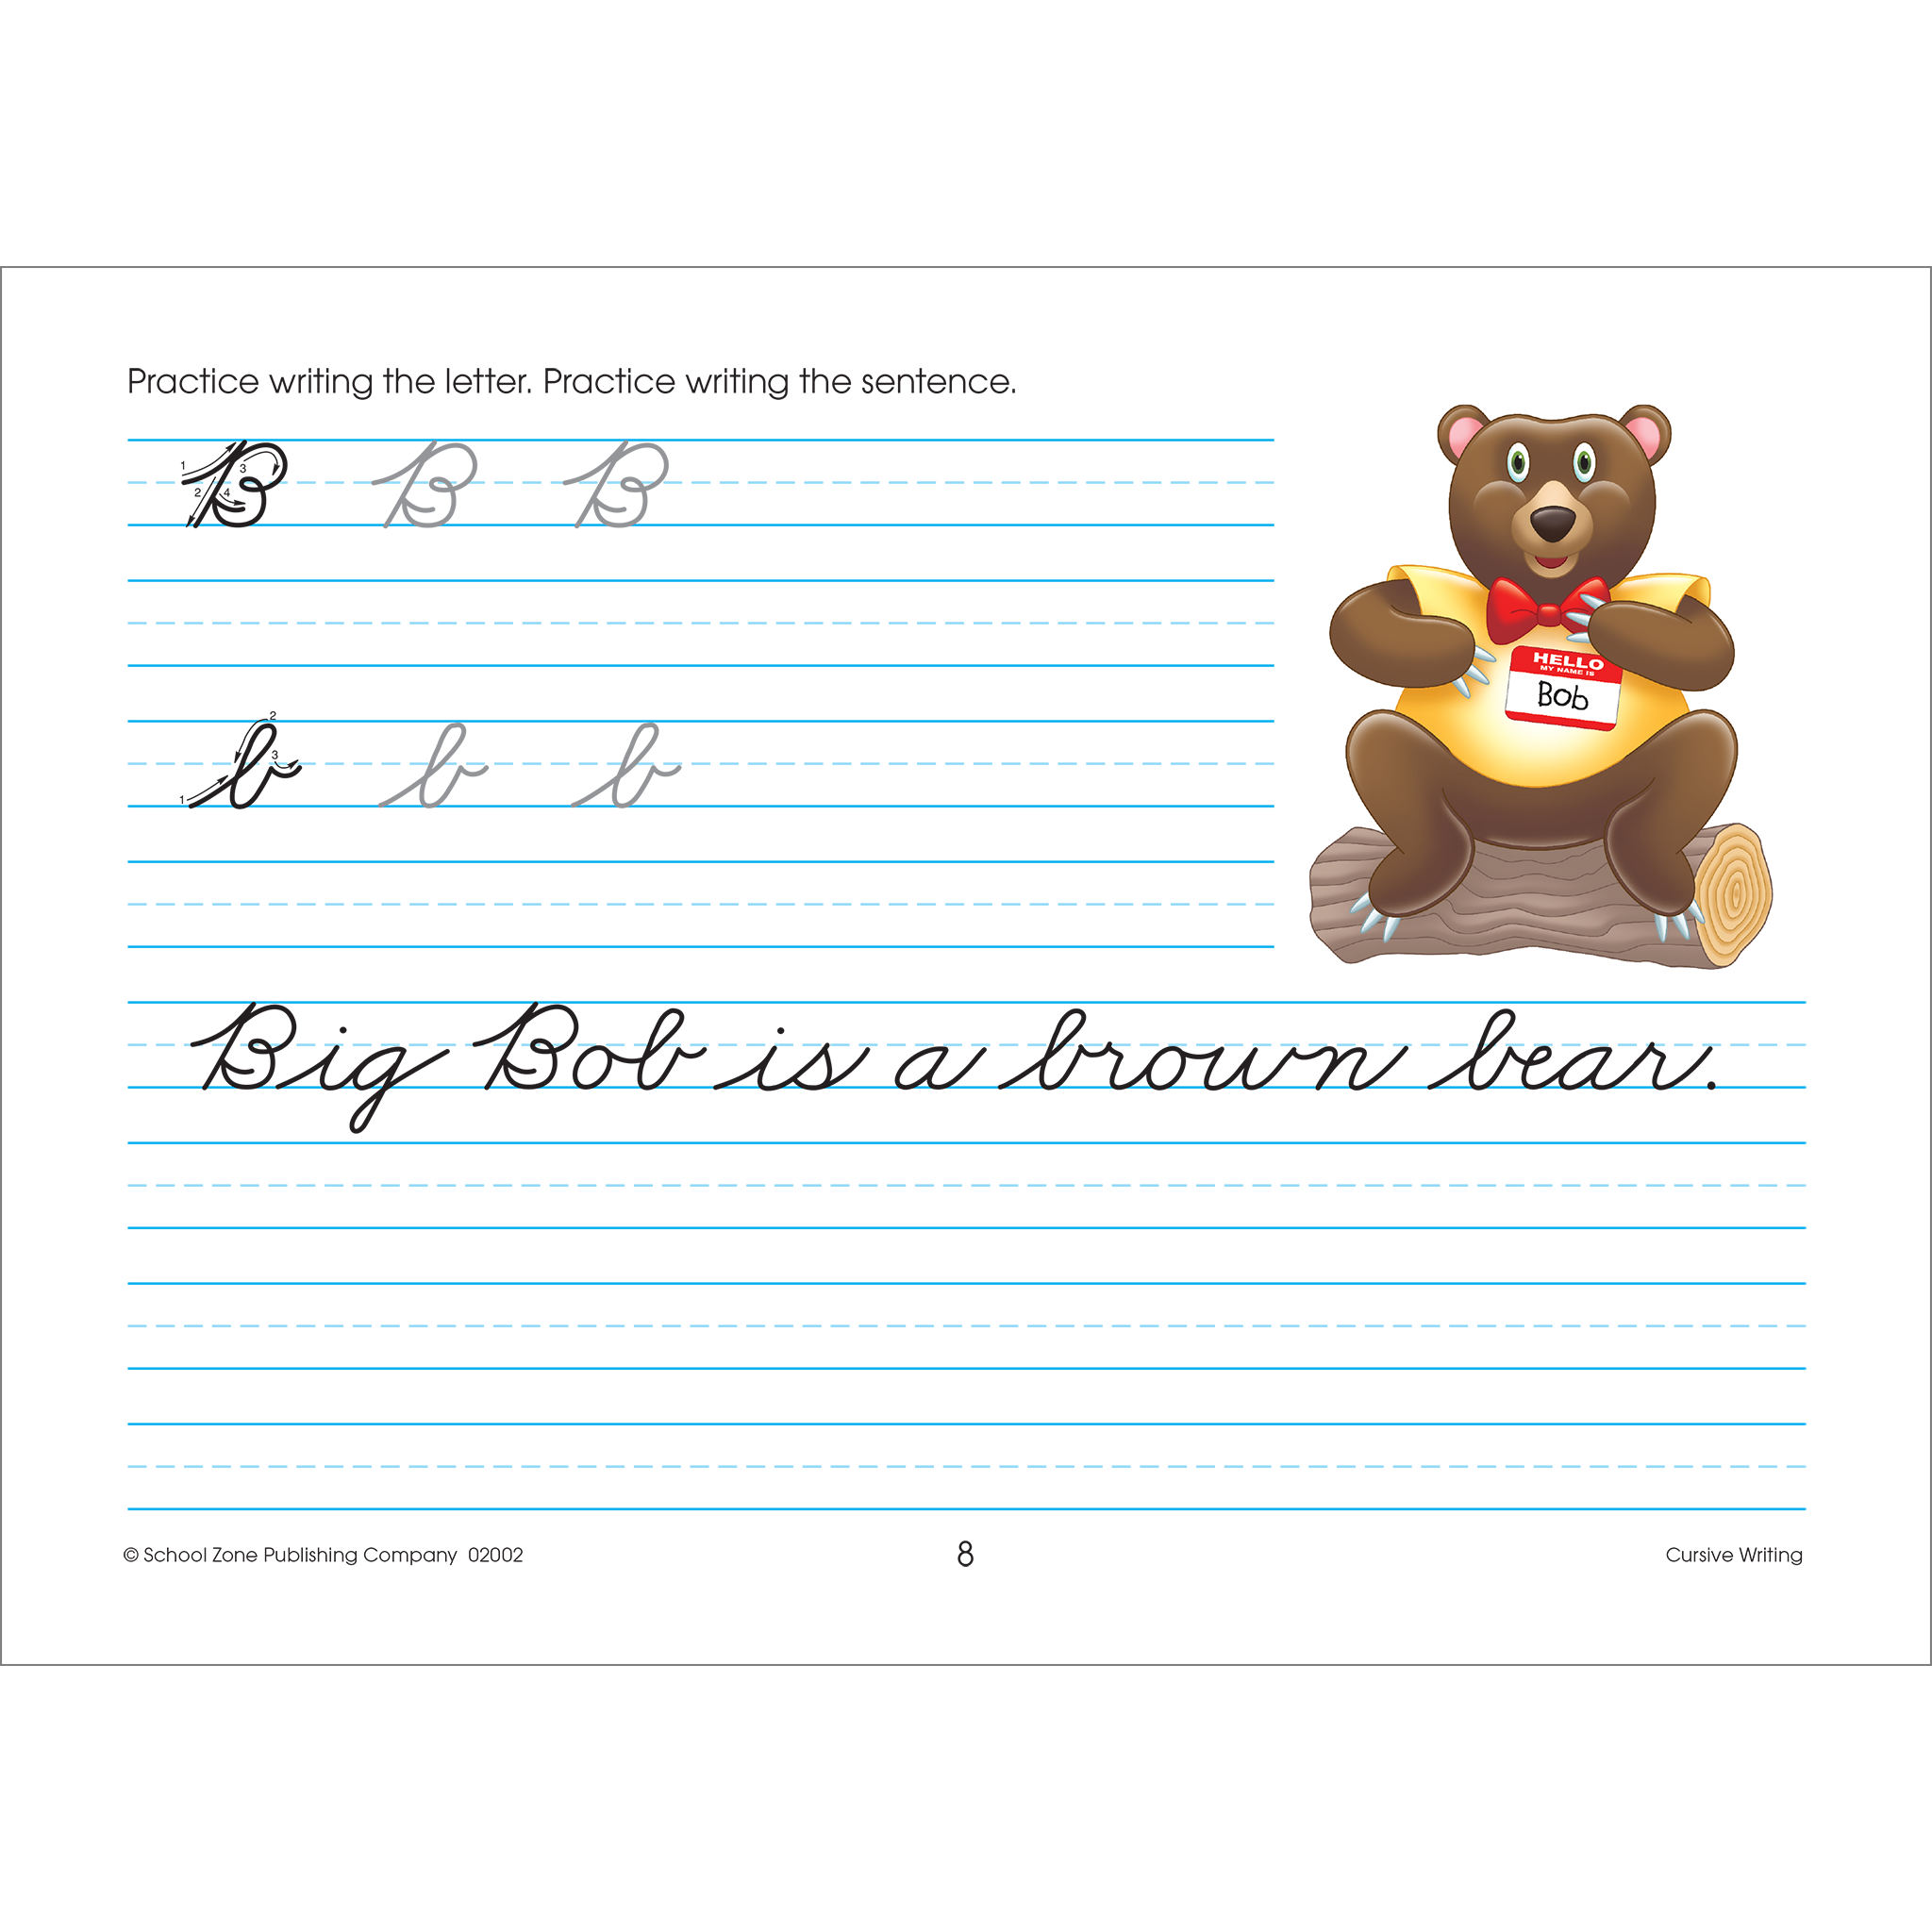 Clipart writing handwriting practice. Cursive workbook shows kids